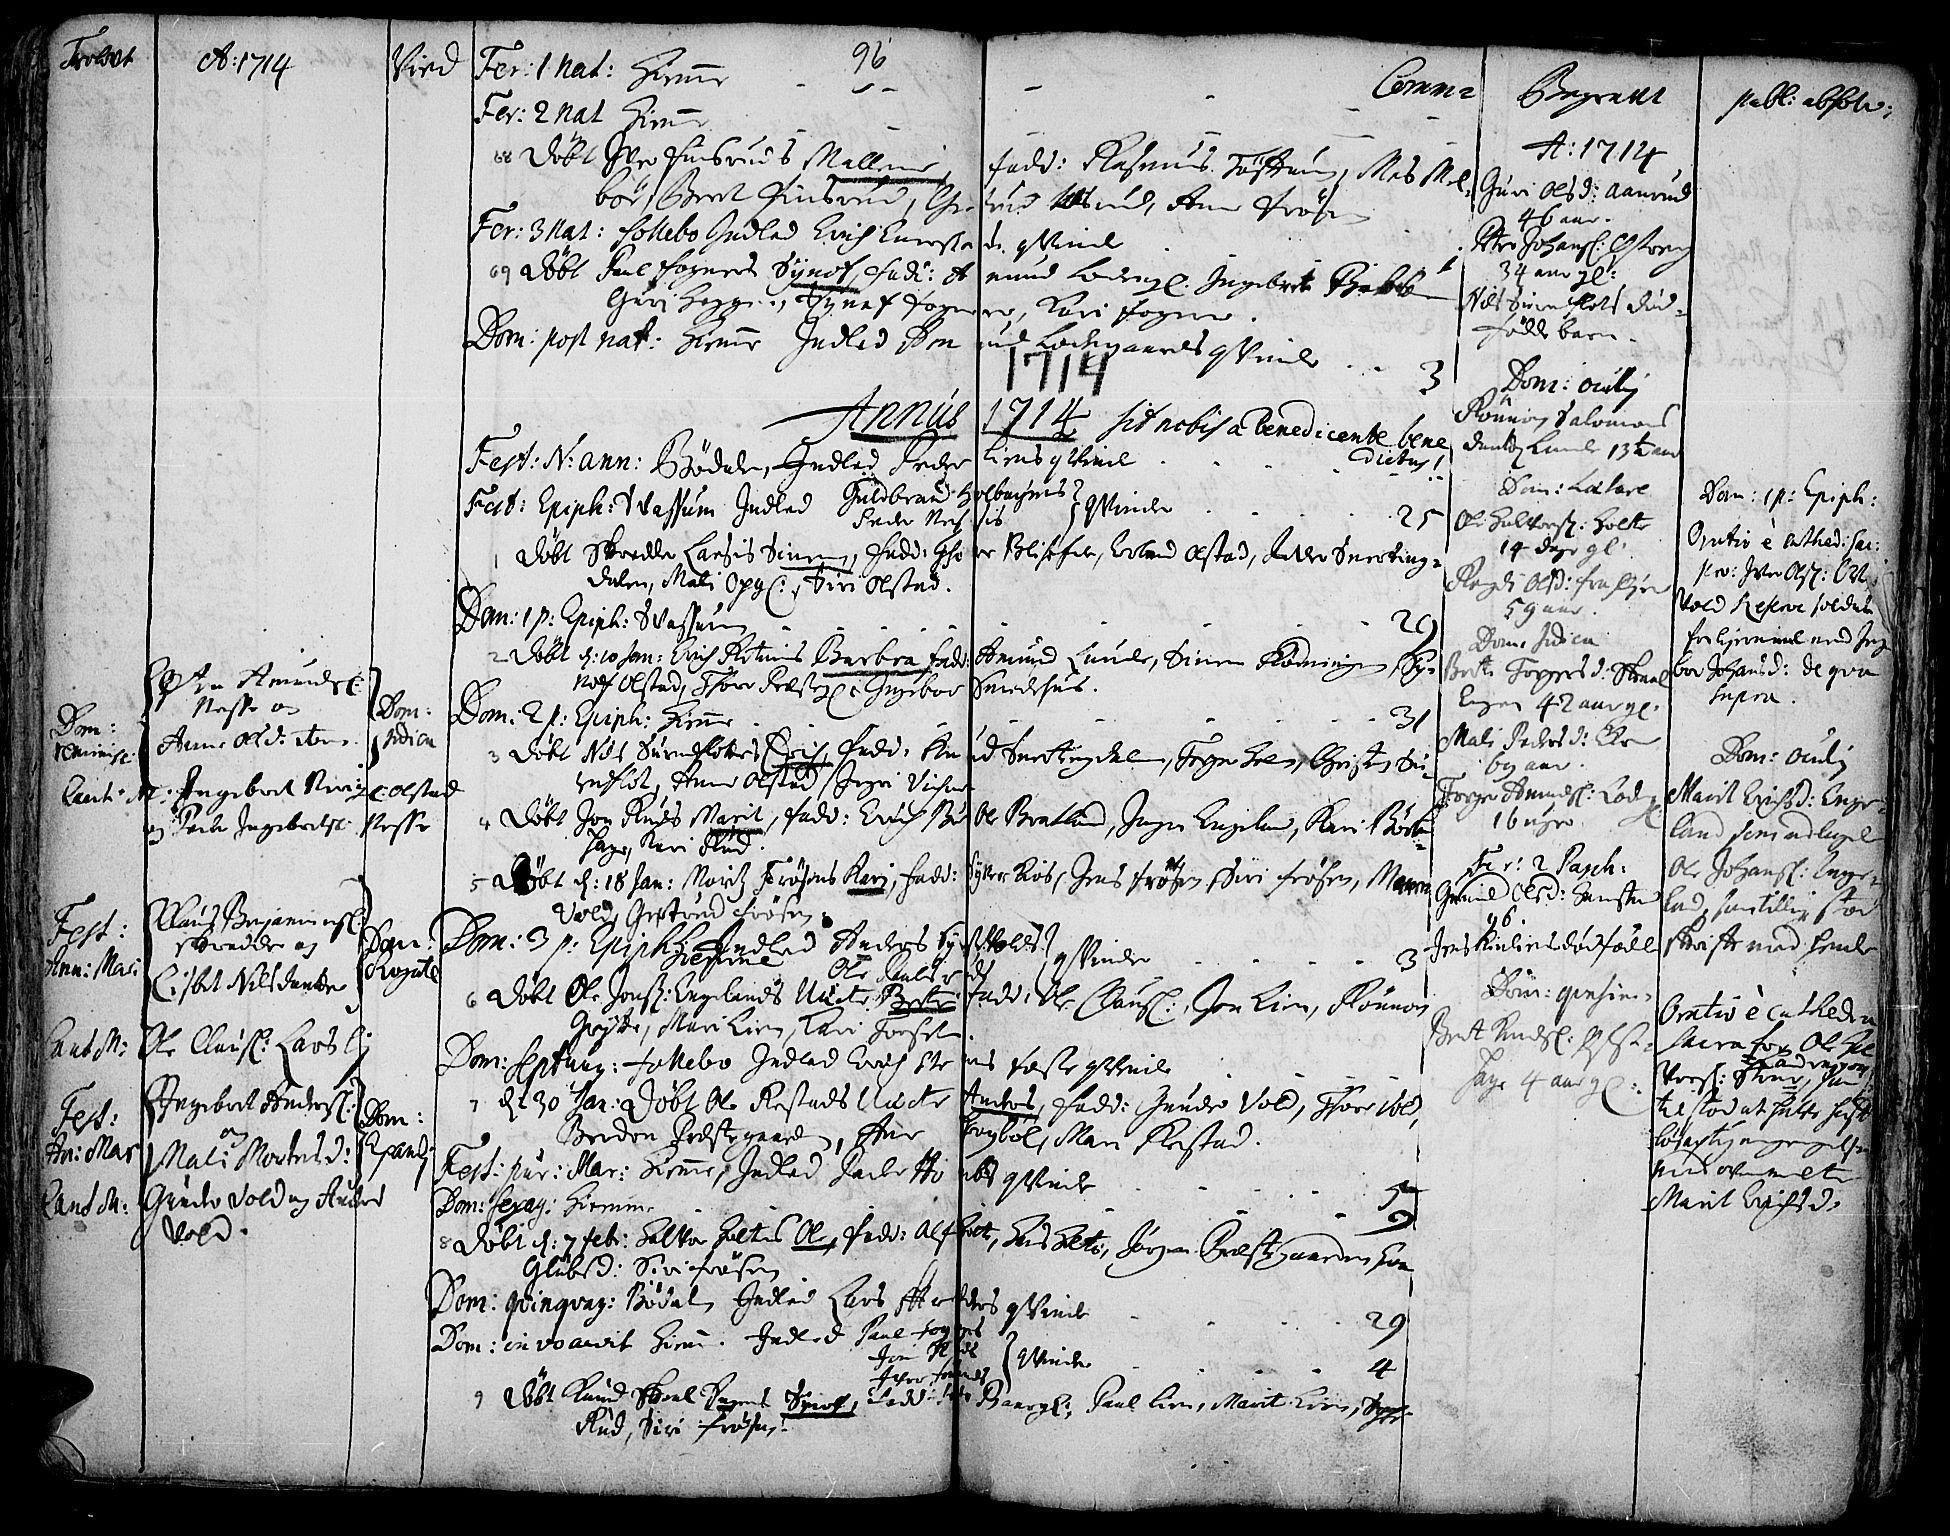 SAH, Gausdal prestekontor, Ministerialbok nr. 1, 1693-1728, s. 96